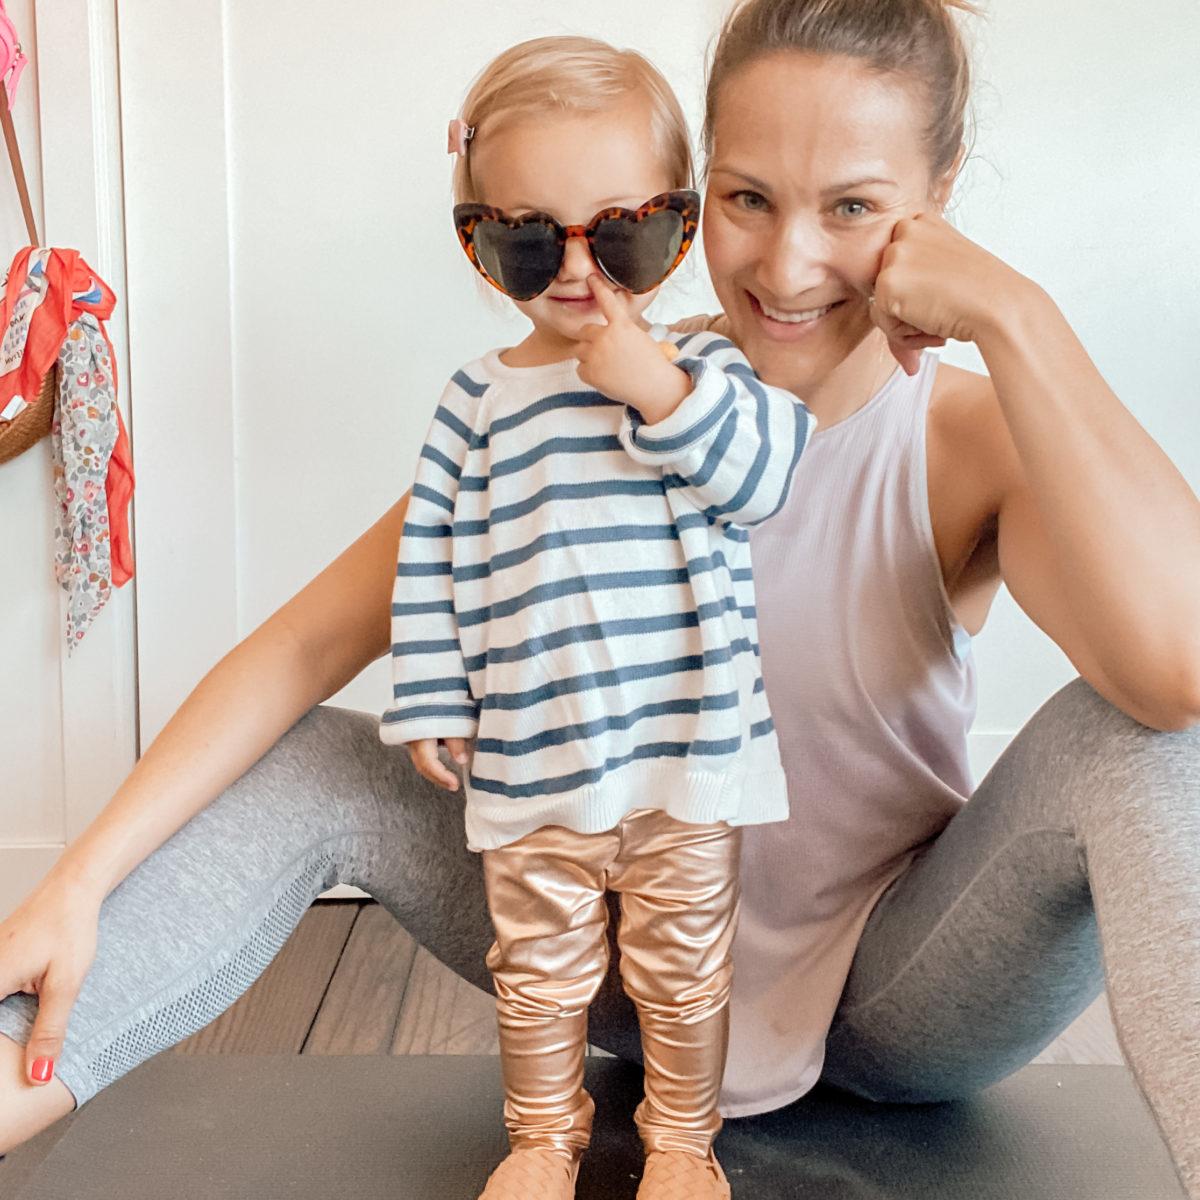 Why Mothers Make the bestentrepreneurs